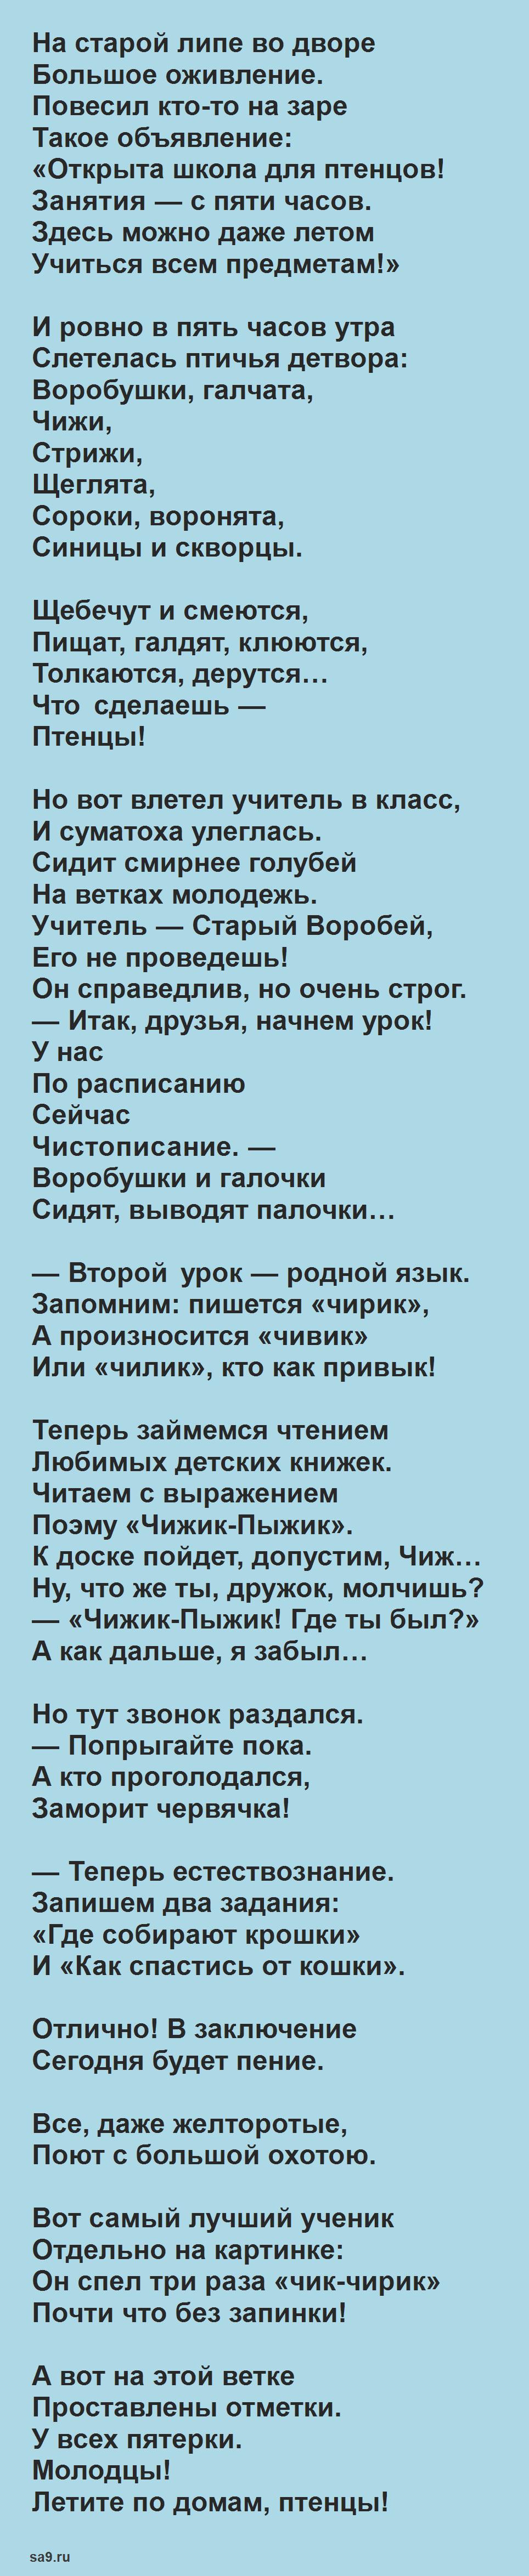 Стих - Птичья школа Борис Заходер